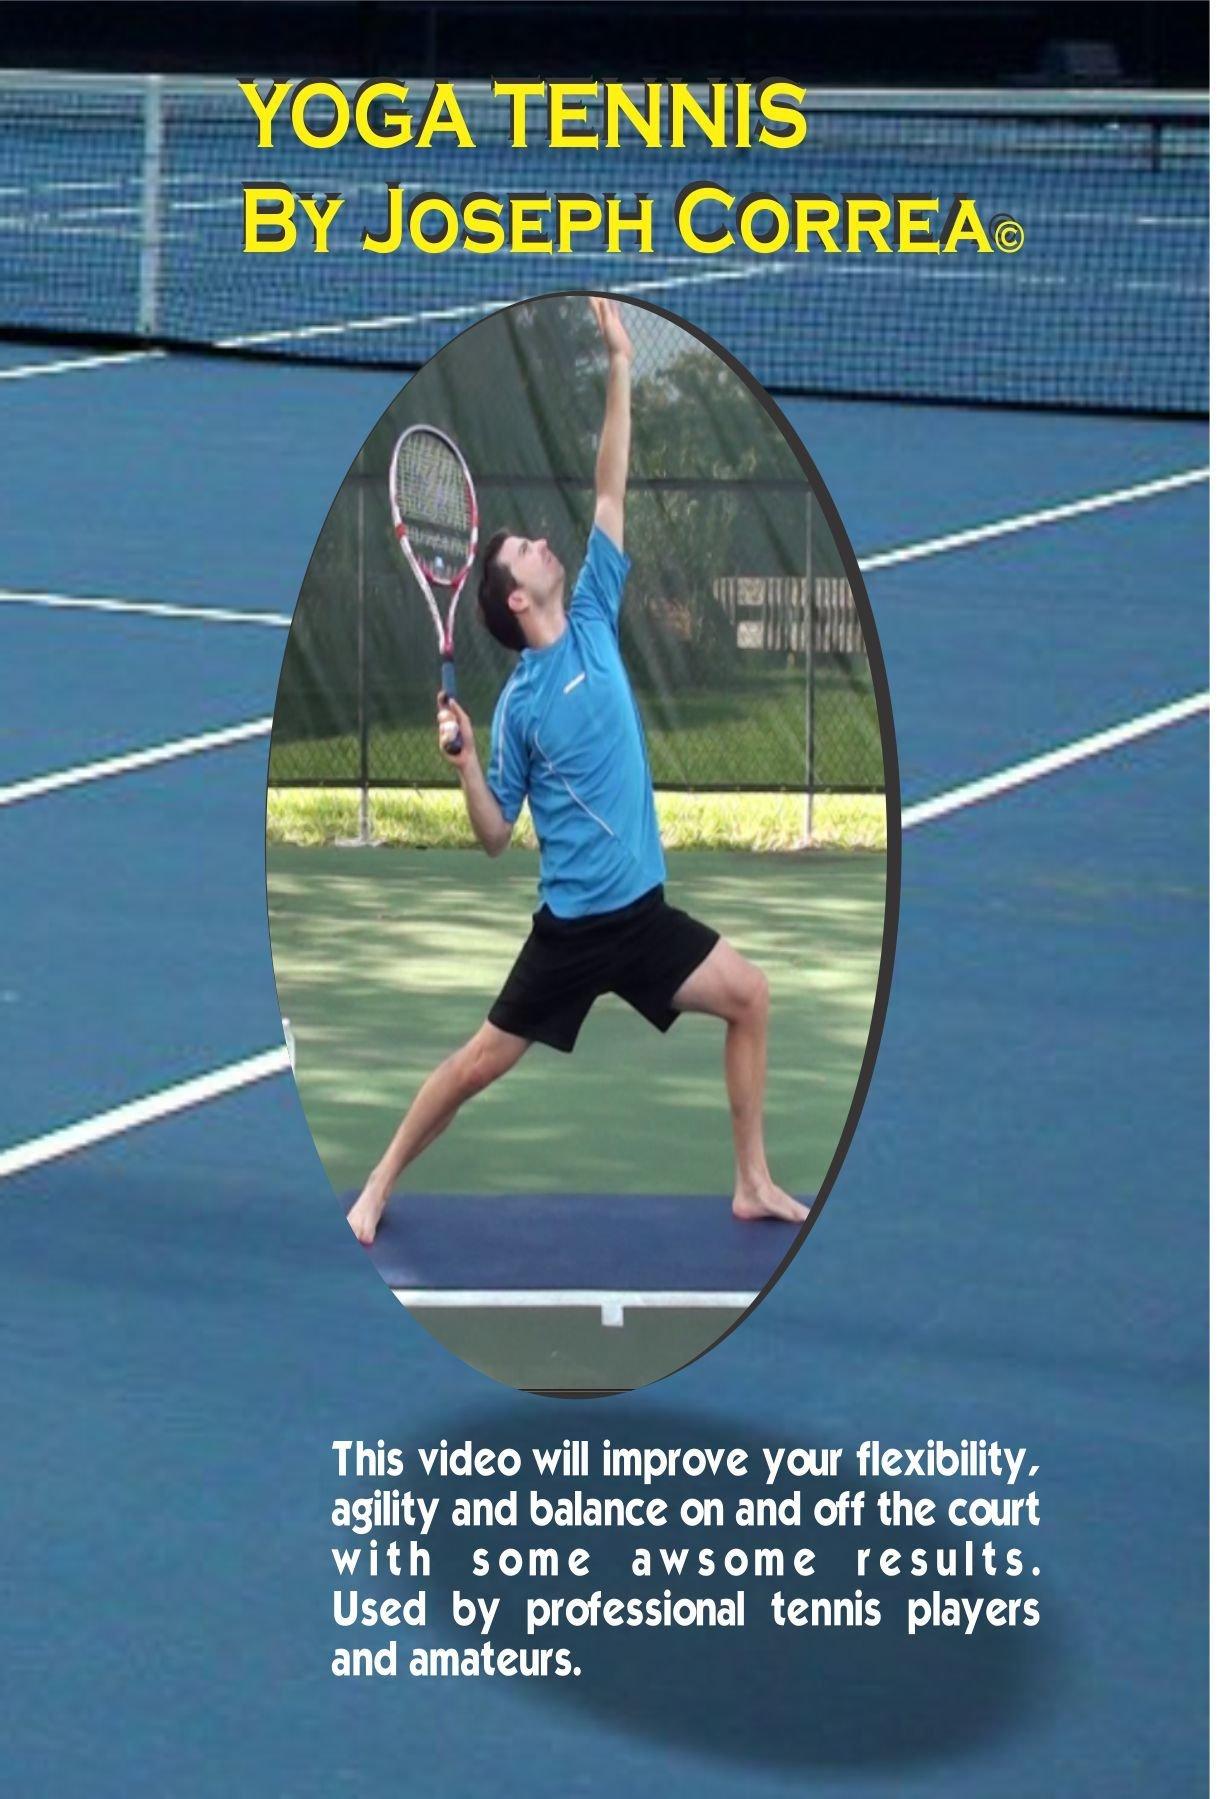 Amazon.com: Yoga Tennis by Joseph Correa: Joseph Correa ...